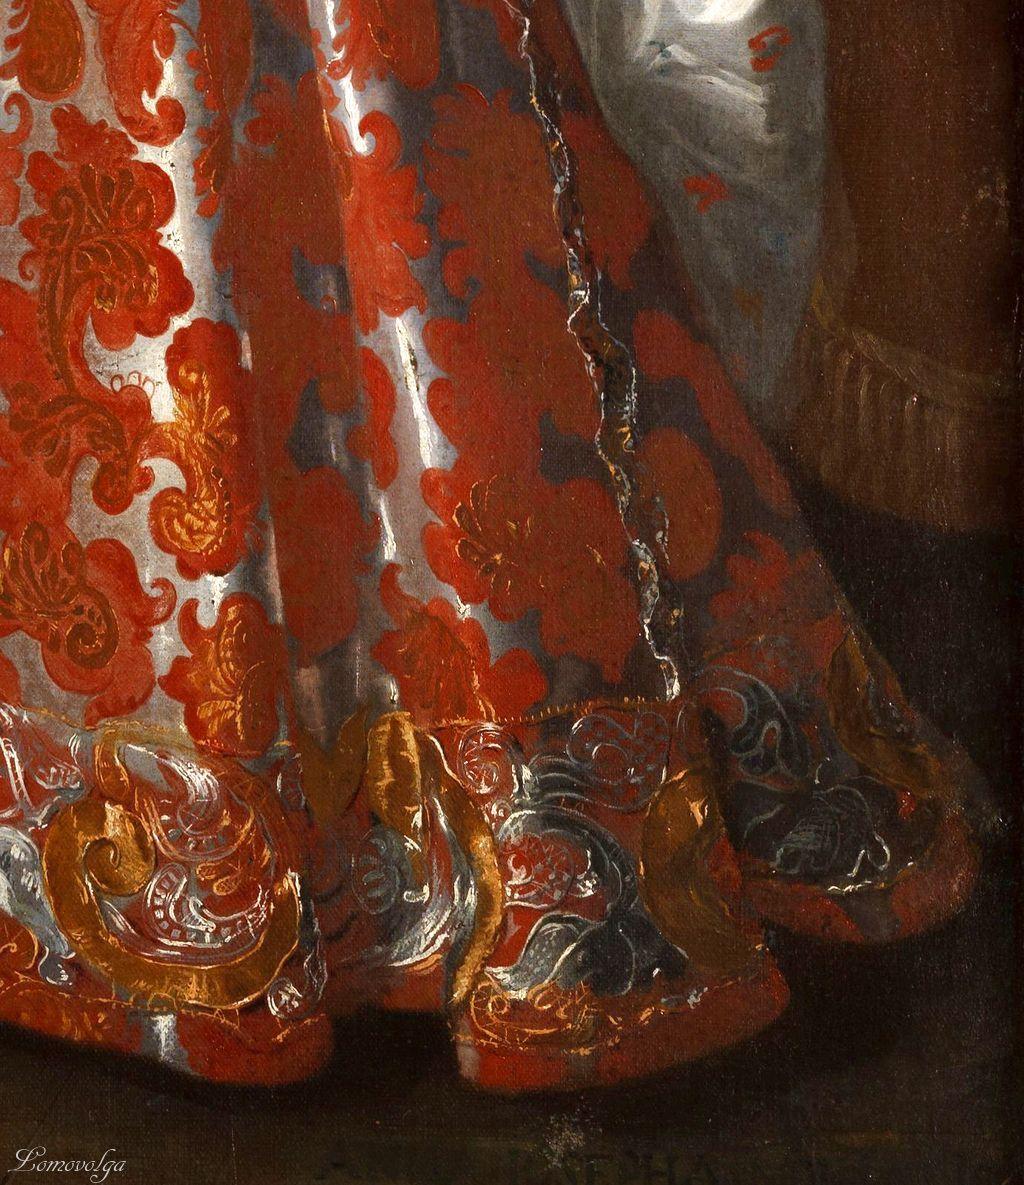 1680s - Anna Josepha Arconati attributed to Pier Francesco Cittadini detail